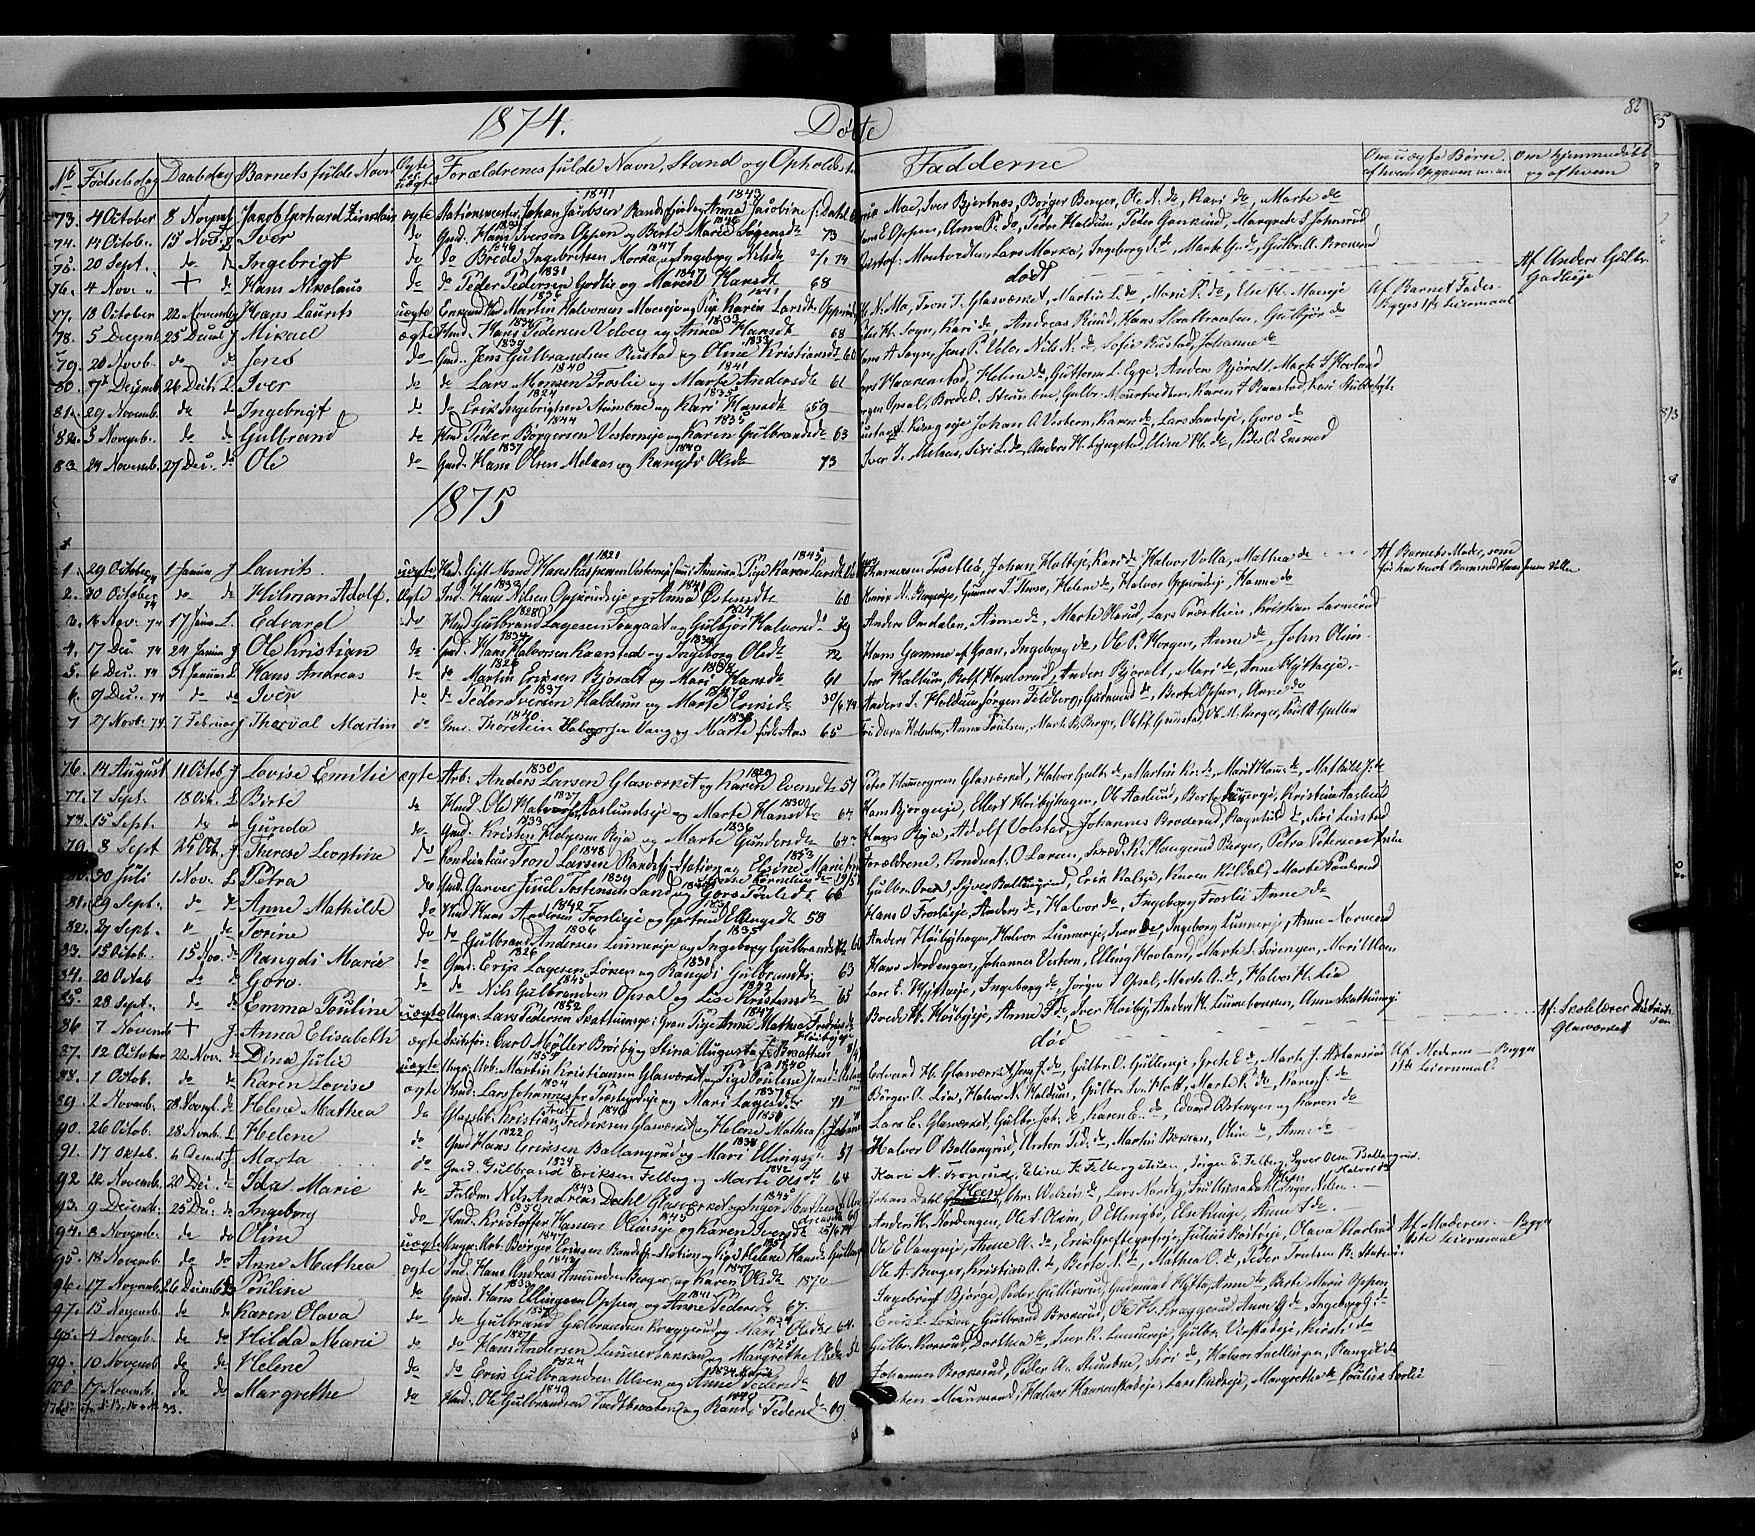 SAH, Jevnaker prestekontor, Ministerialbok nr. 7, 1858-1876, s. 82